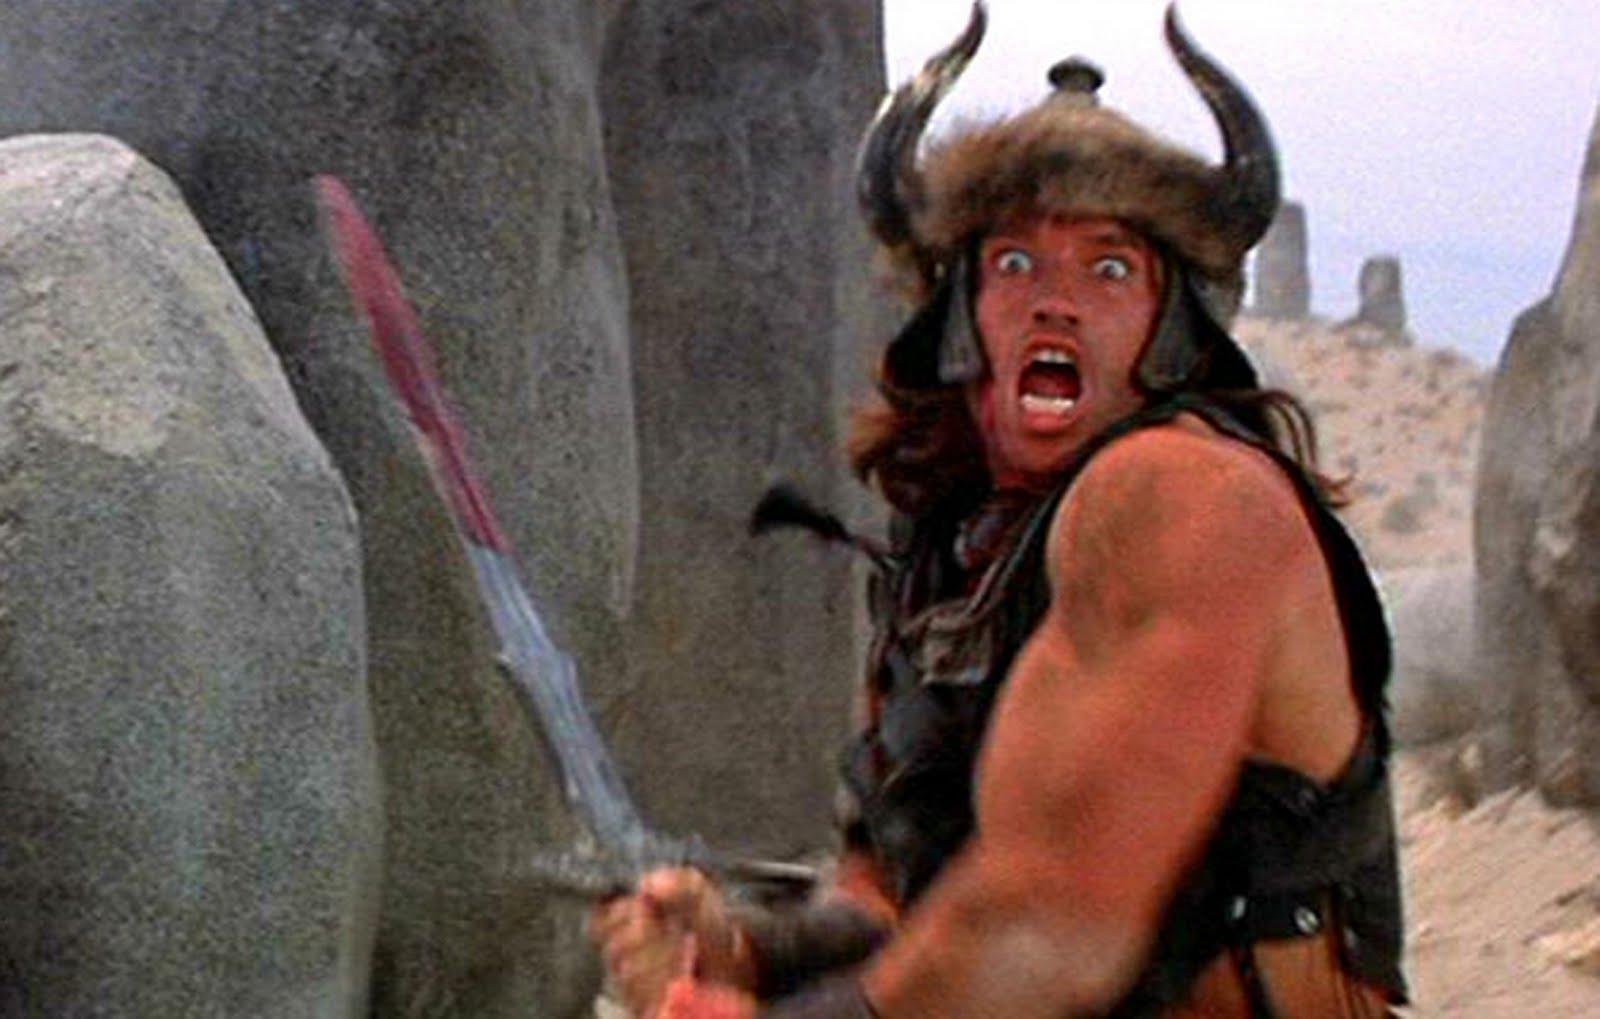 Conan 2011 Beautiful conan the barbarian (1982)   the blog of delights